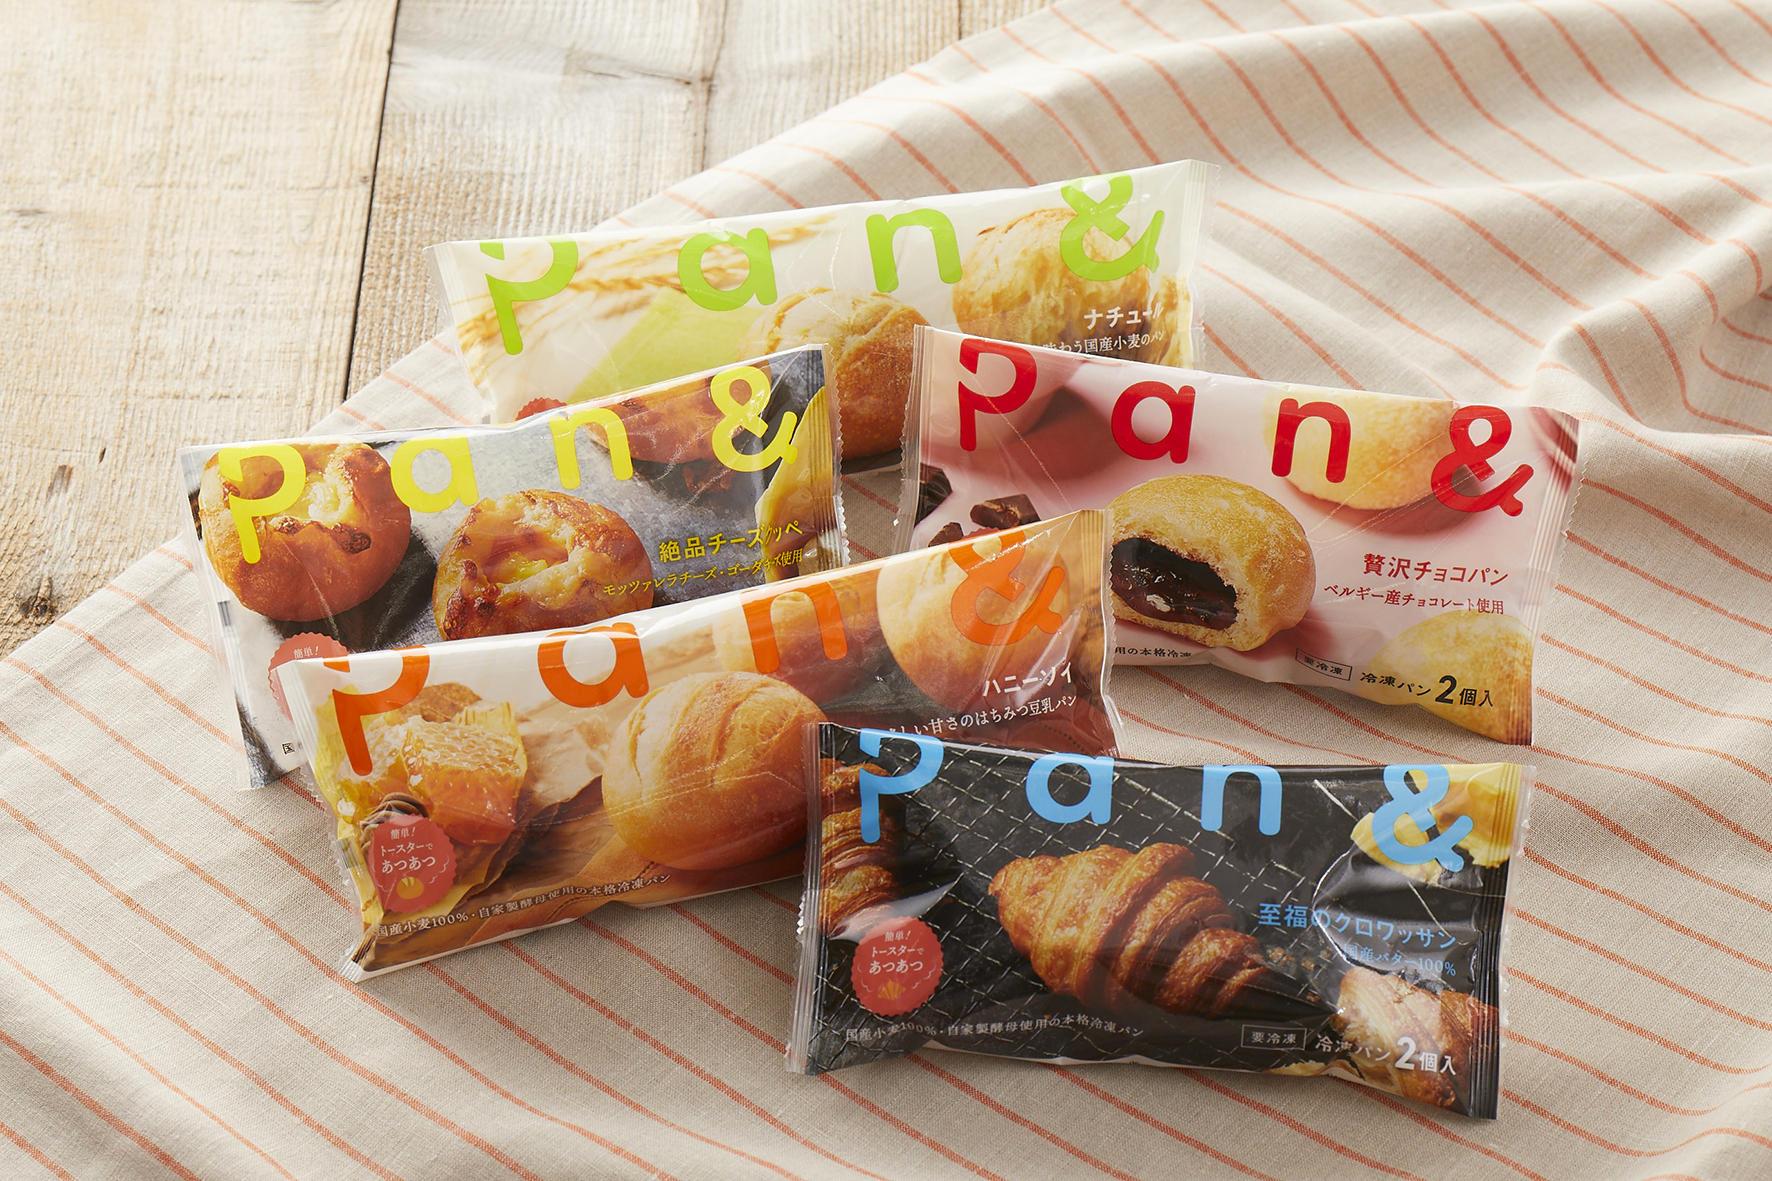 Pan&パッケージ5種.jpg